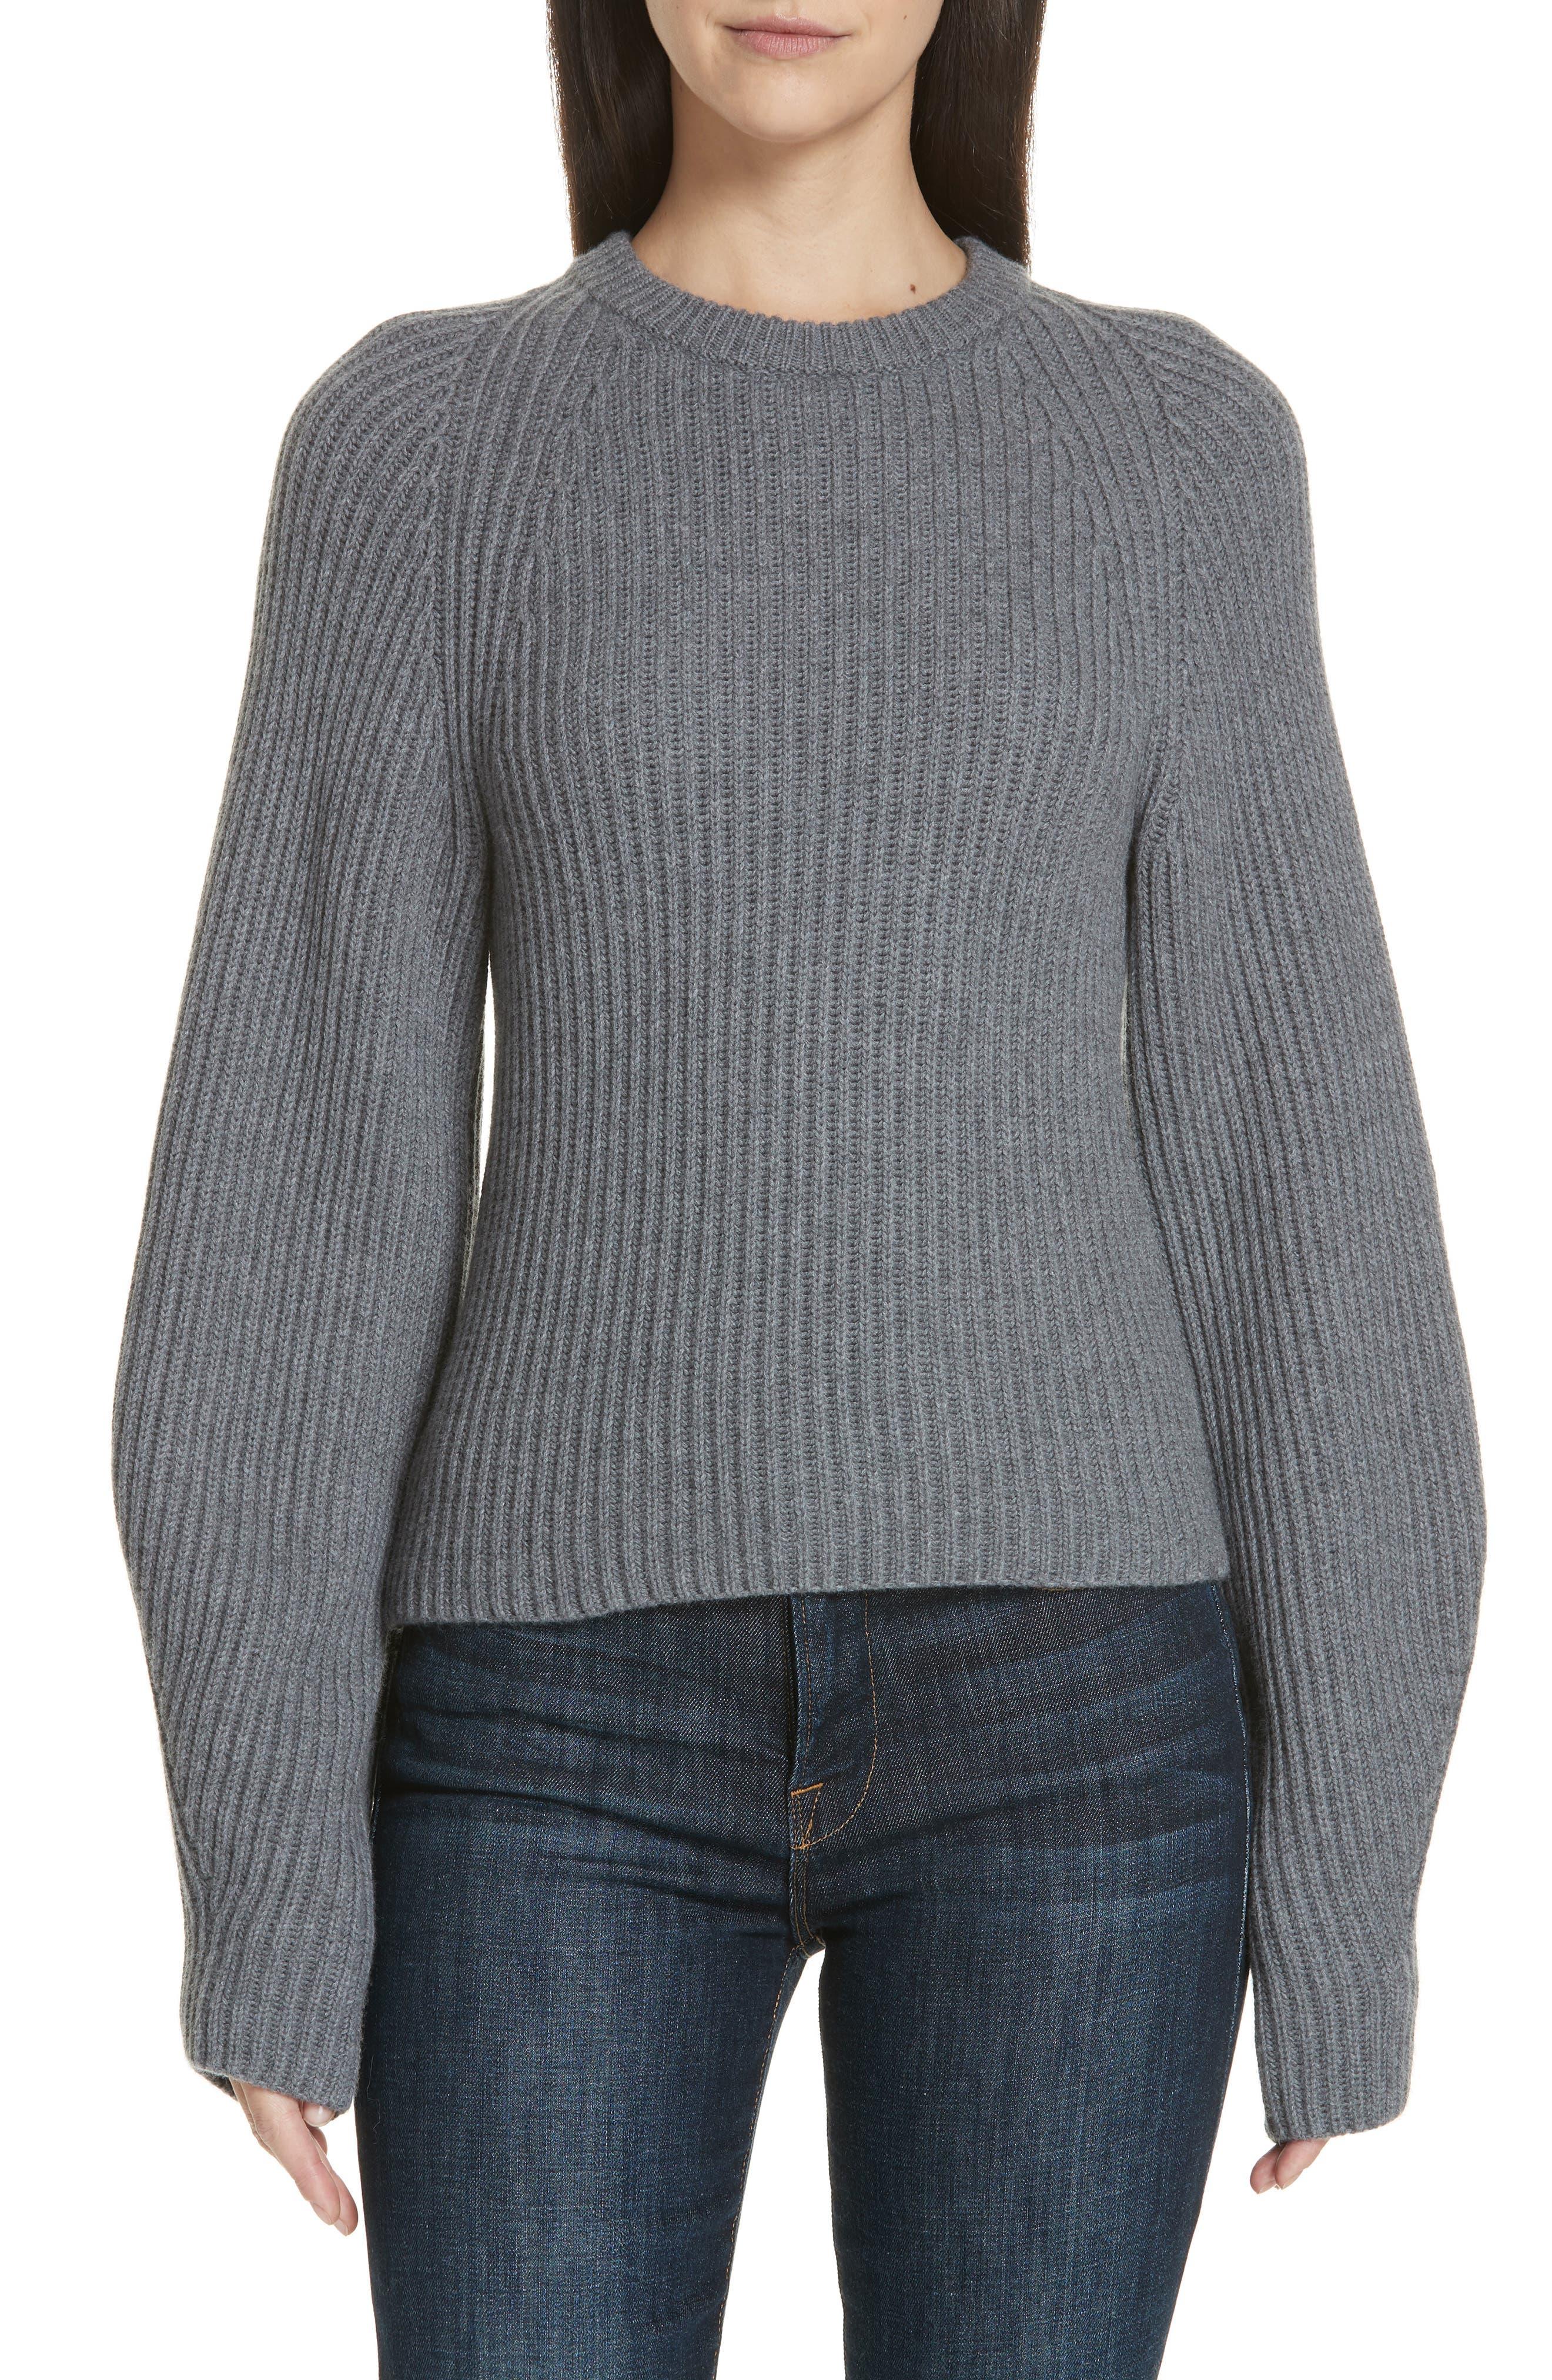 Theory Sculpted Sleeve Shaker Stitch Merino Wool Sweater, Grey